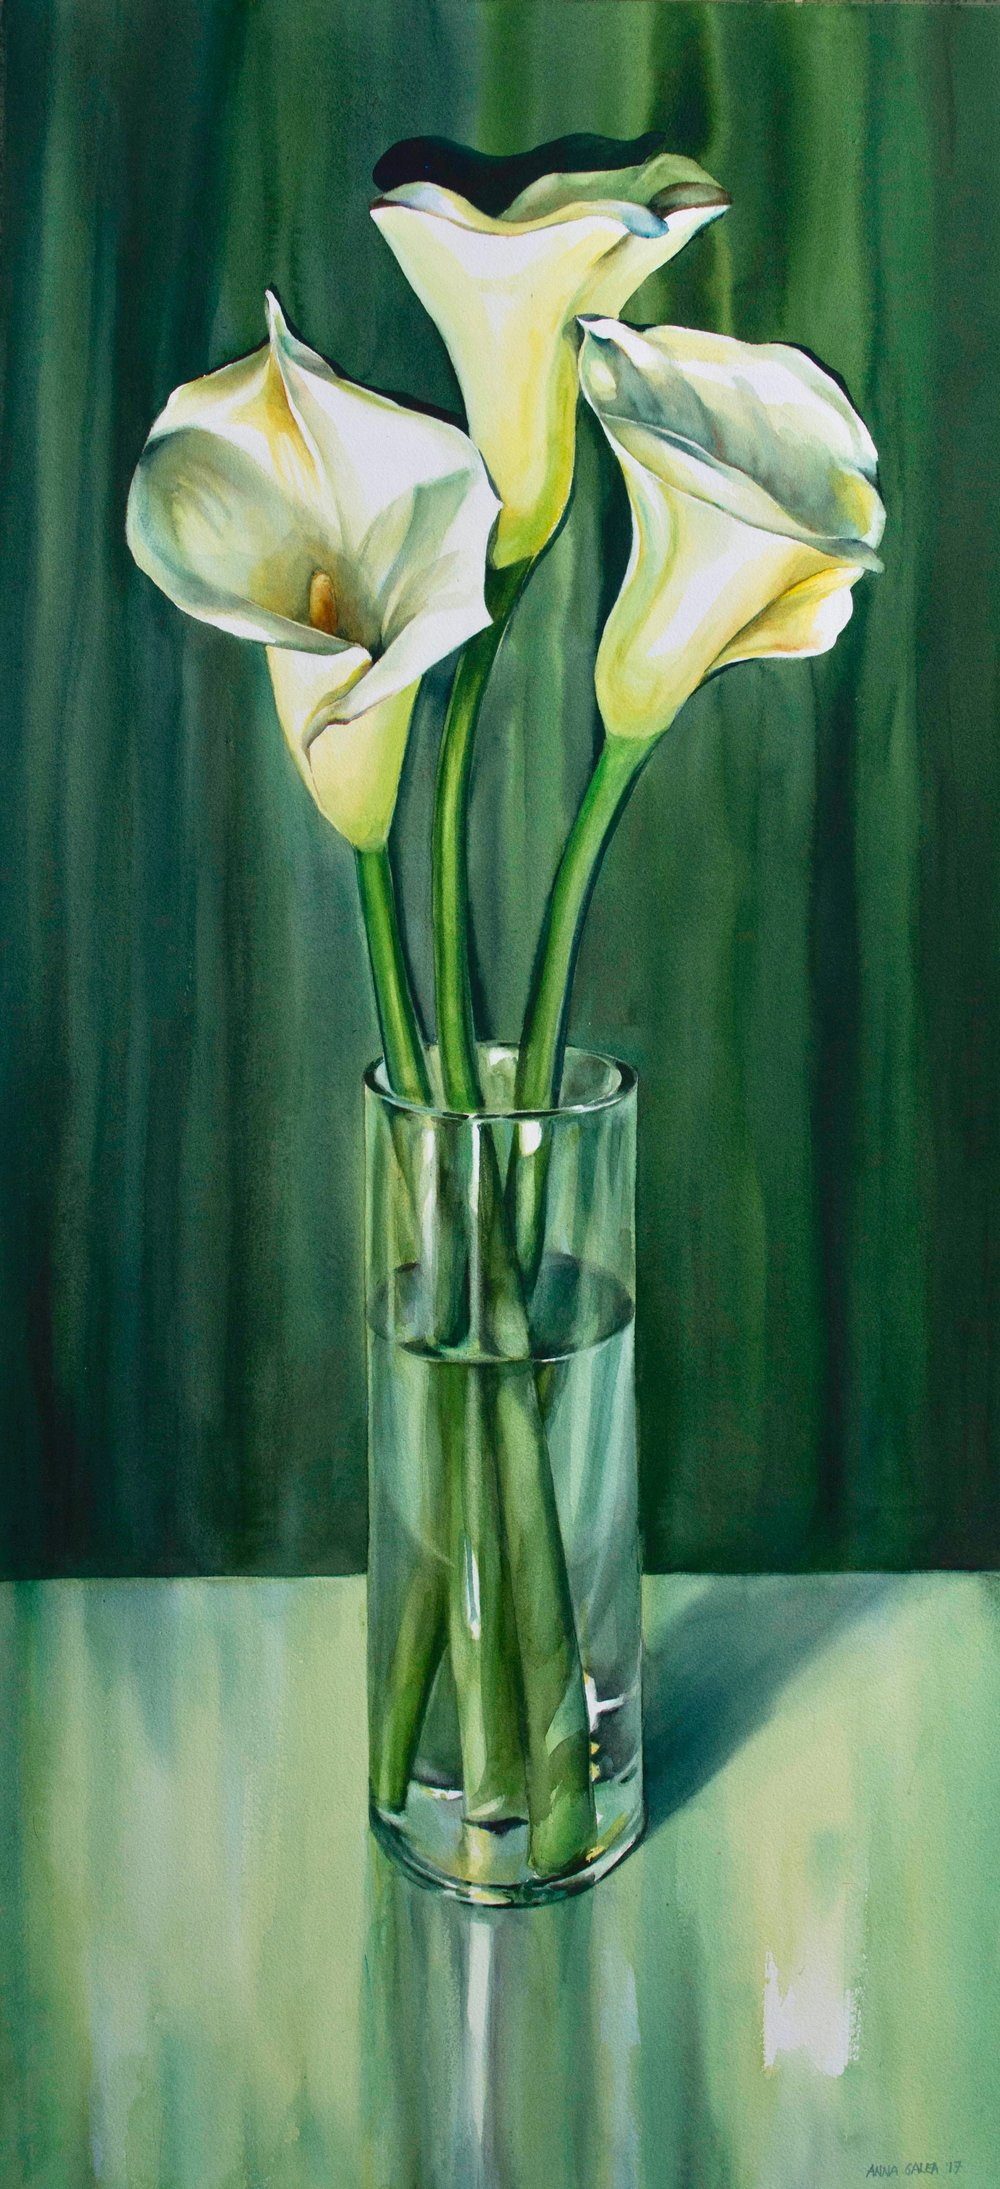 Three Lilies, 2017, Watercolour, 47x21 inches